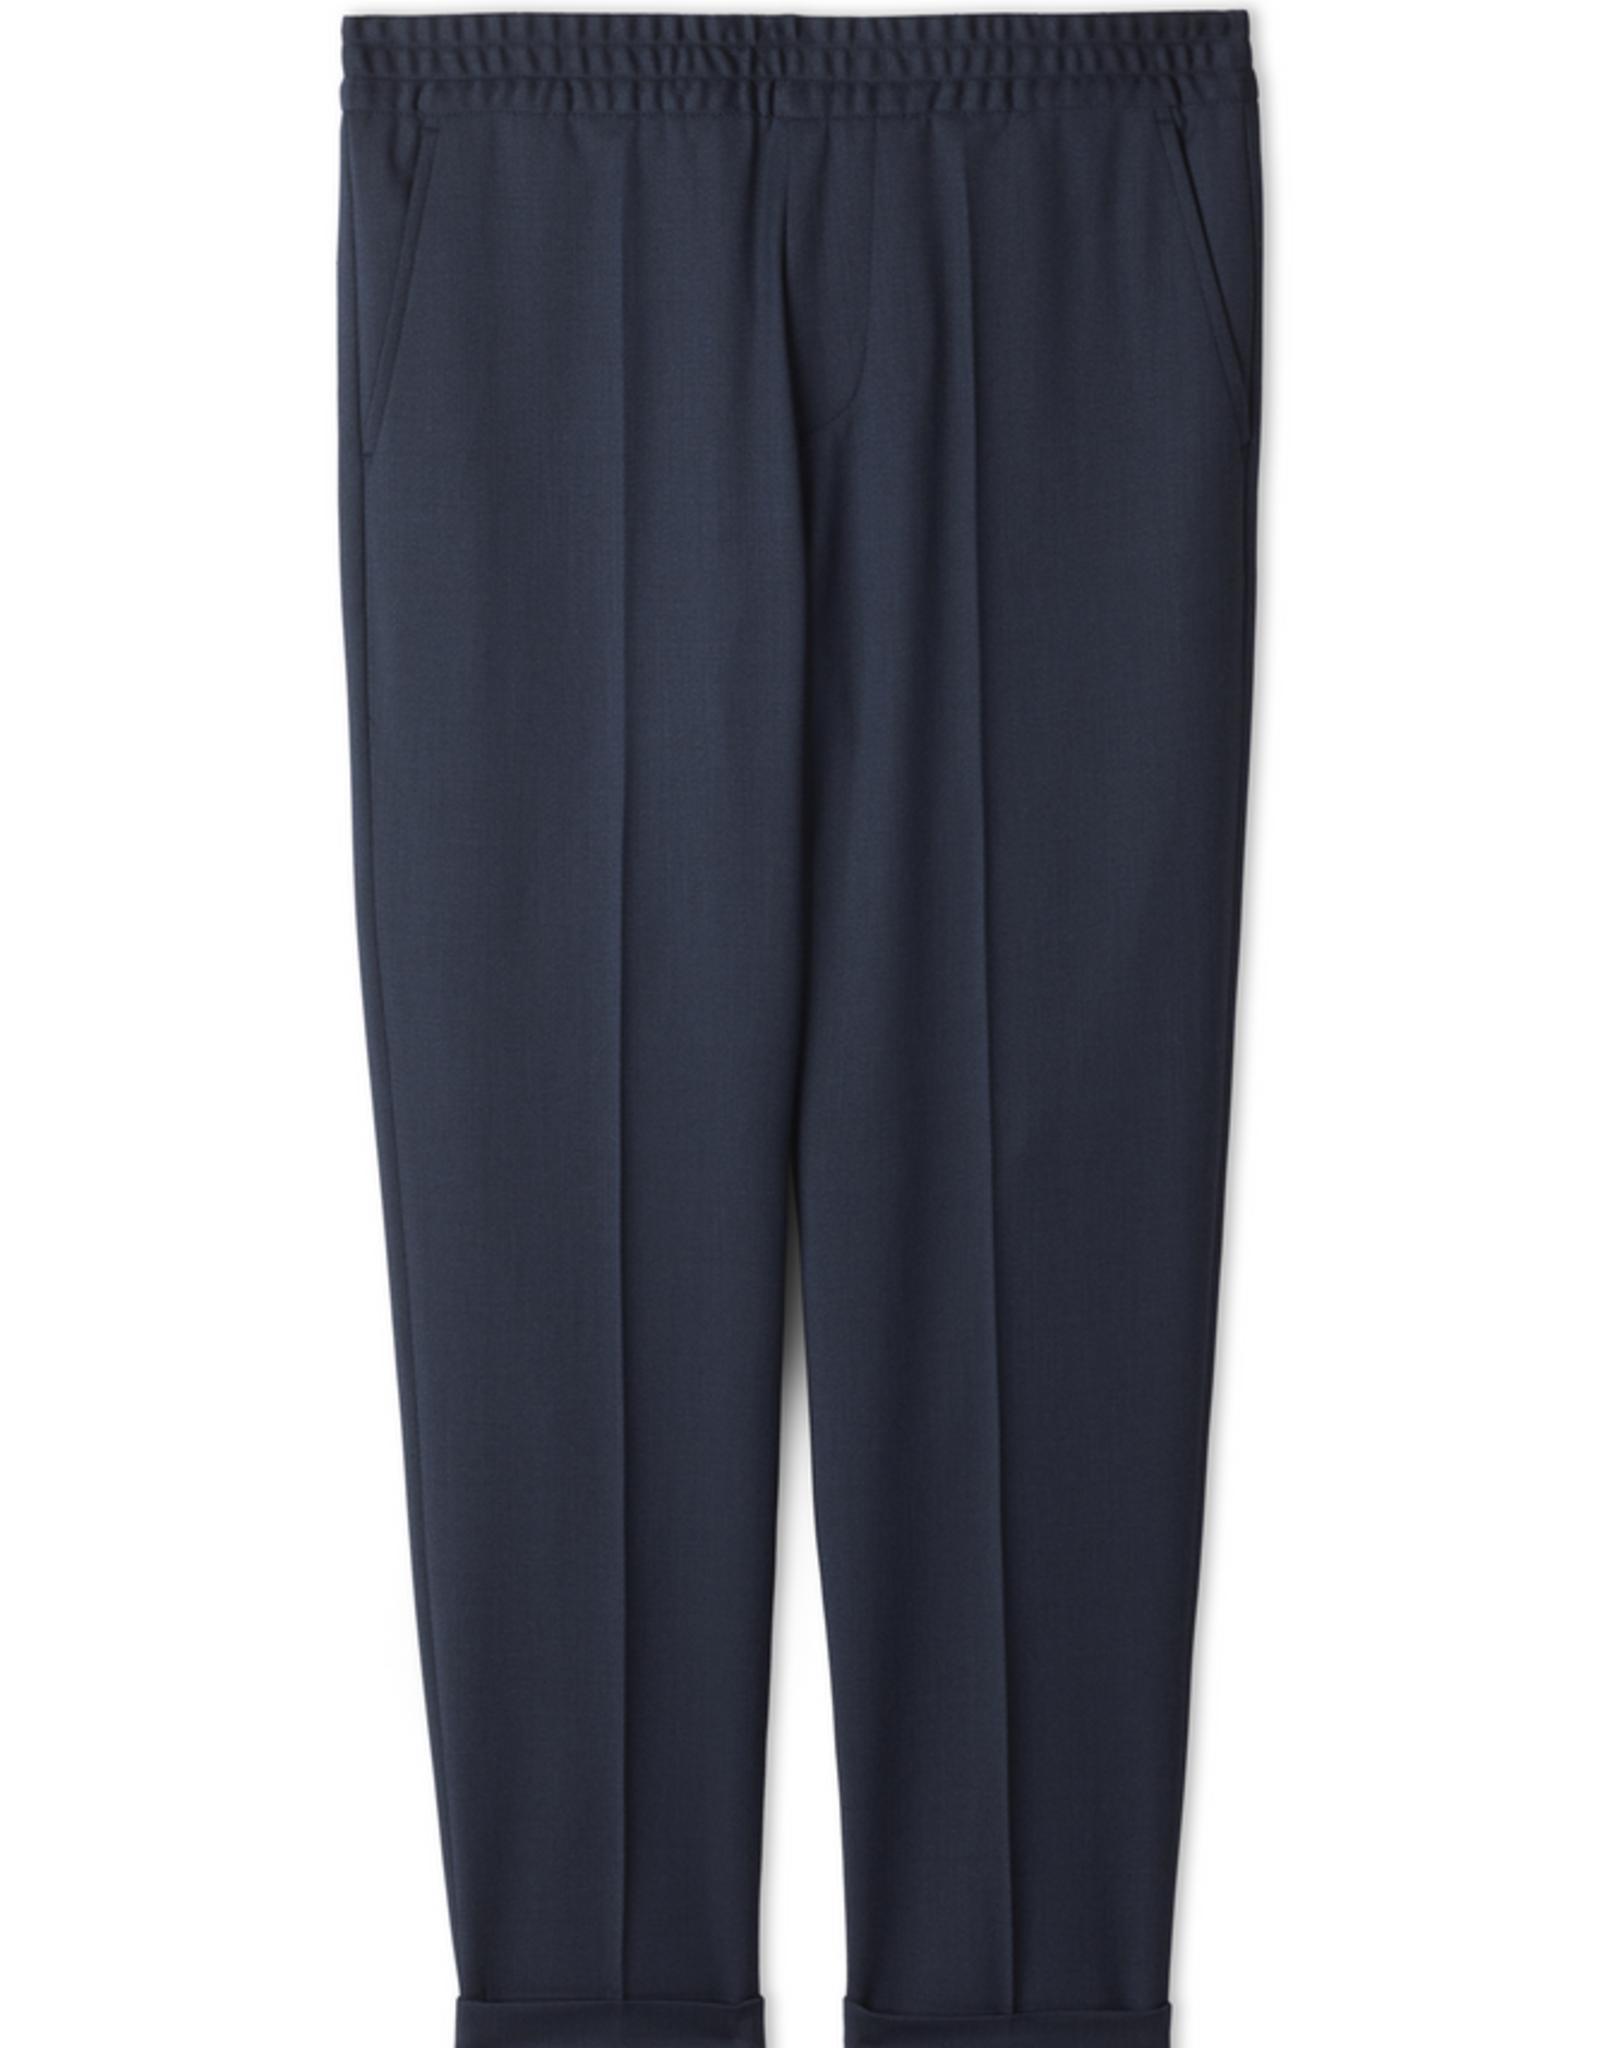 Filippa K M. Terry Cropped Trouser Dark Blue